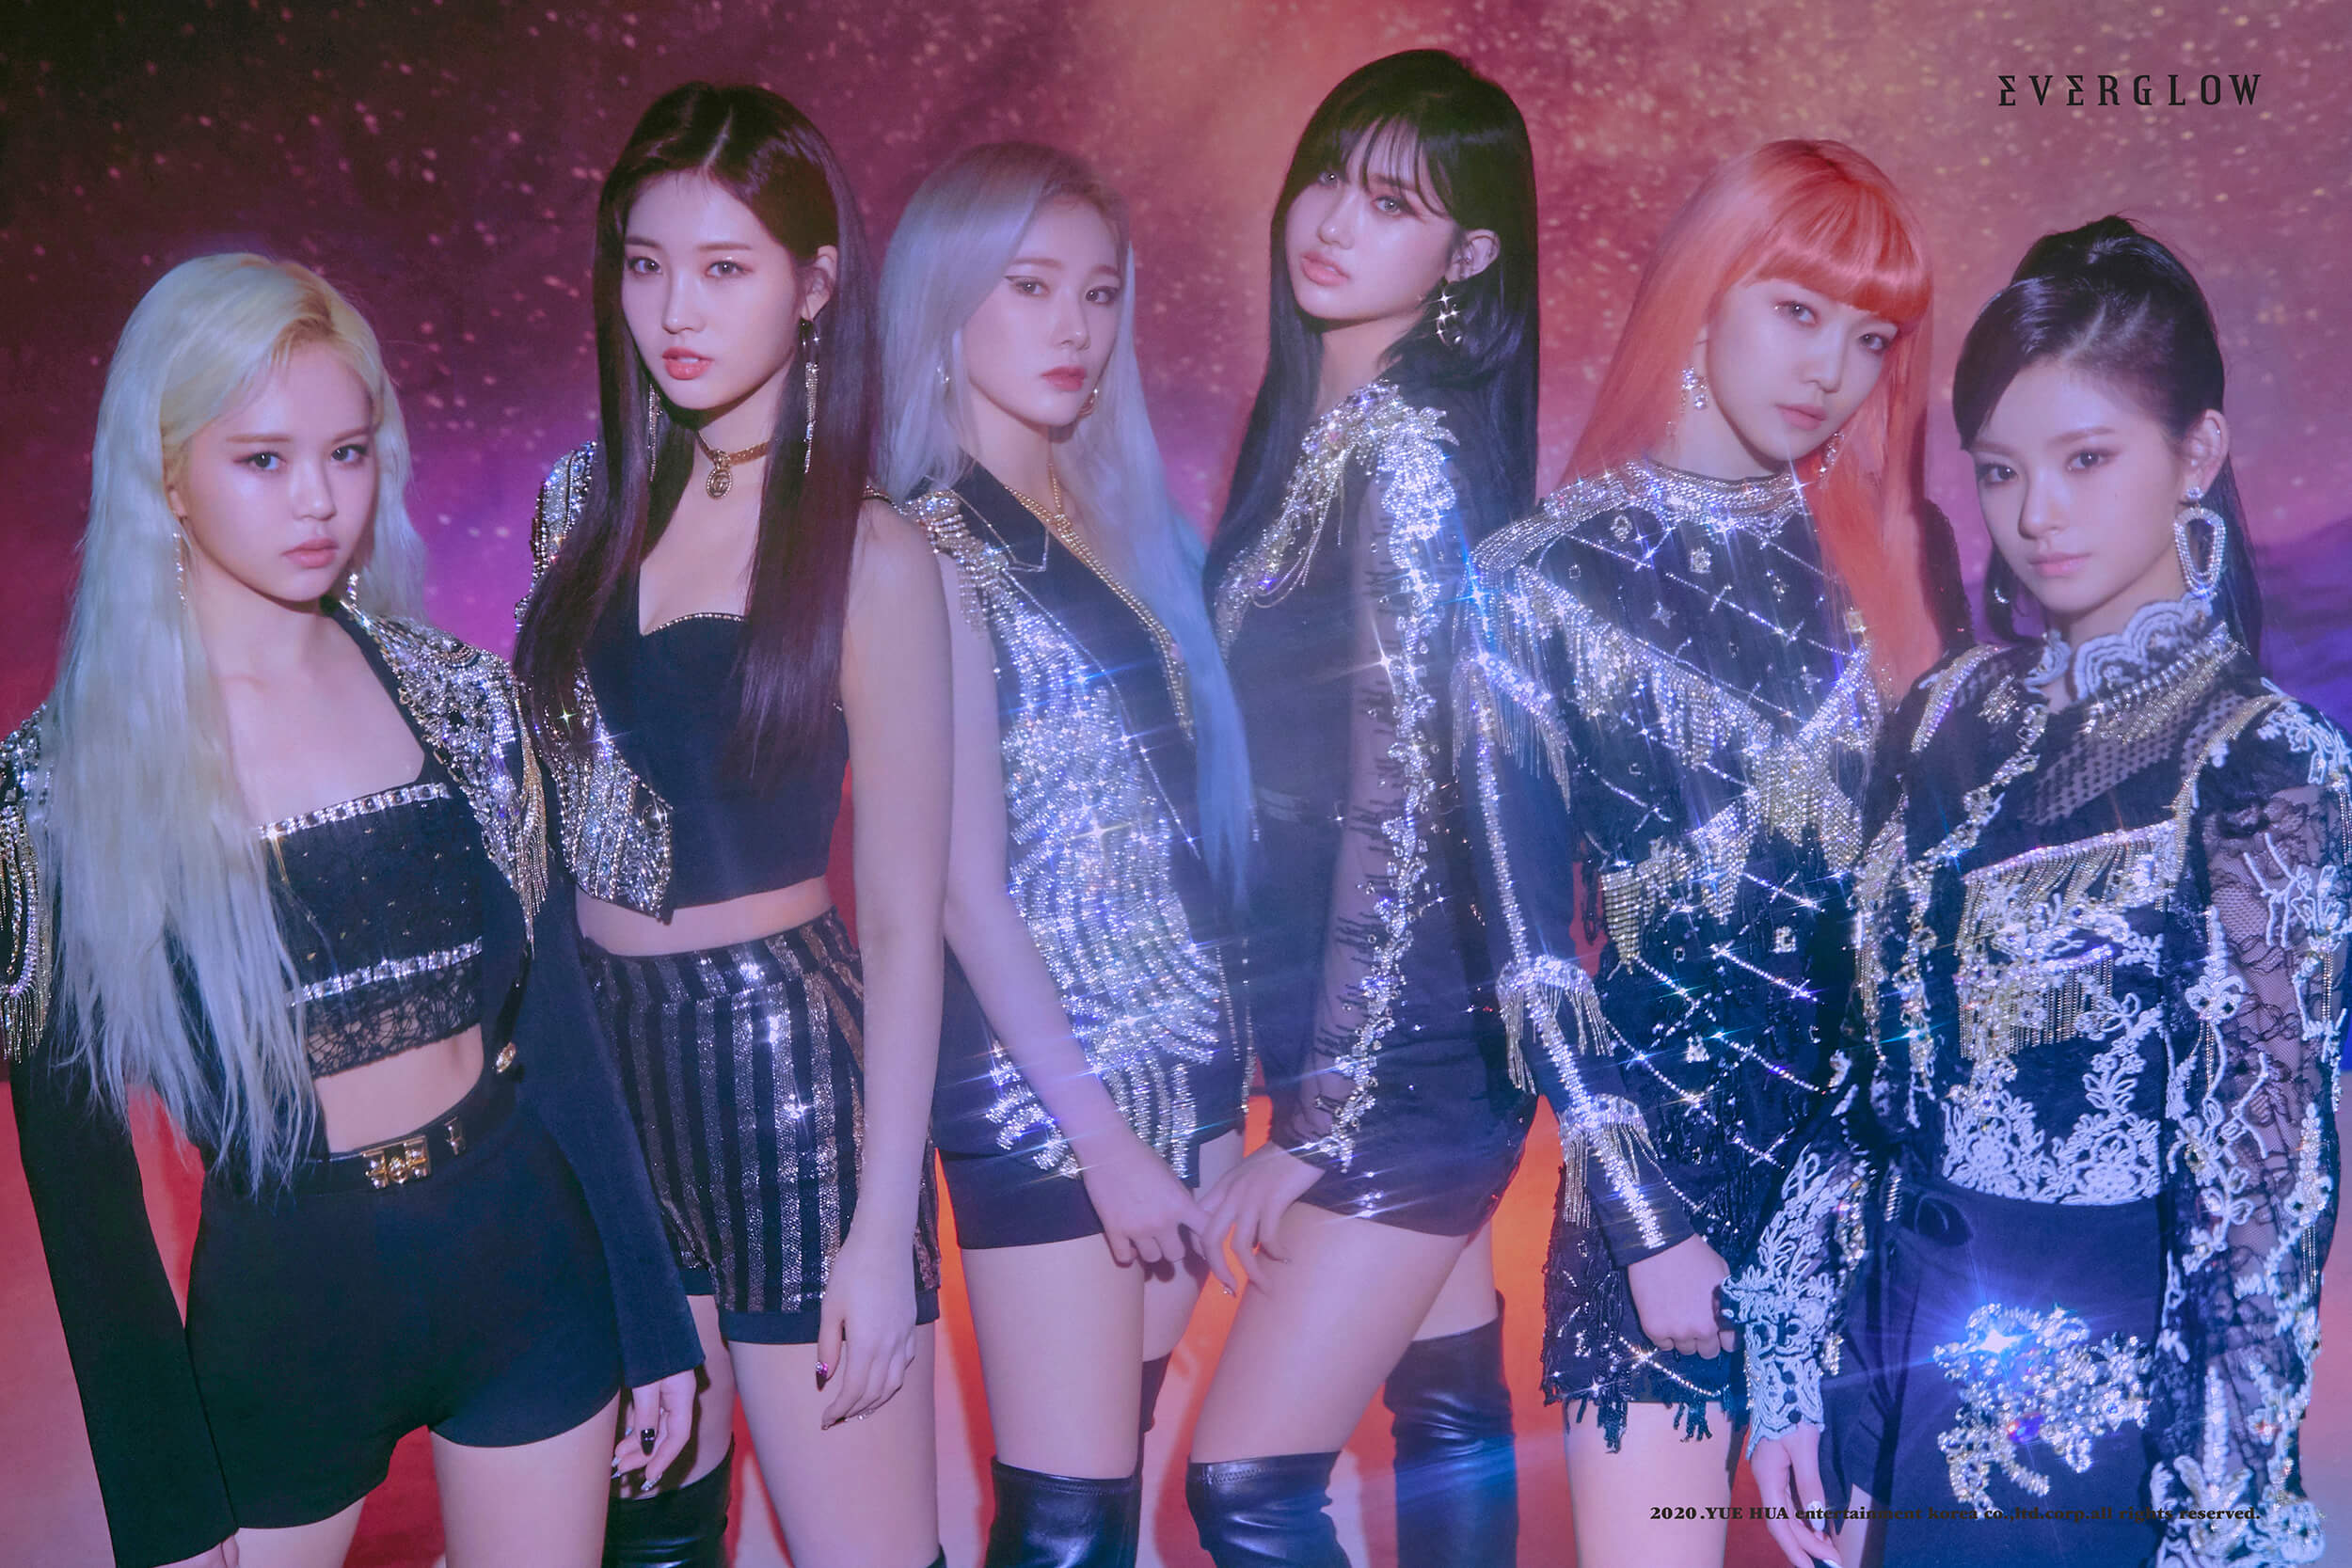 lightstick everglow Yuehua Entertainment